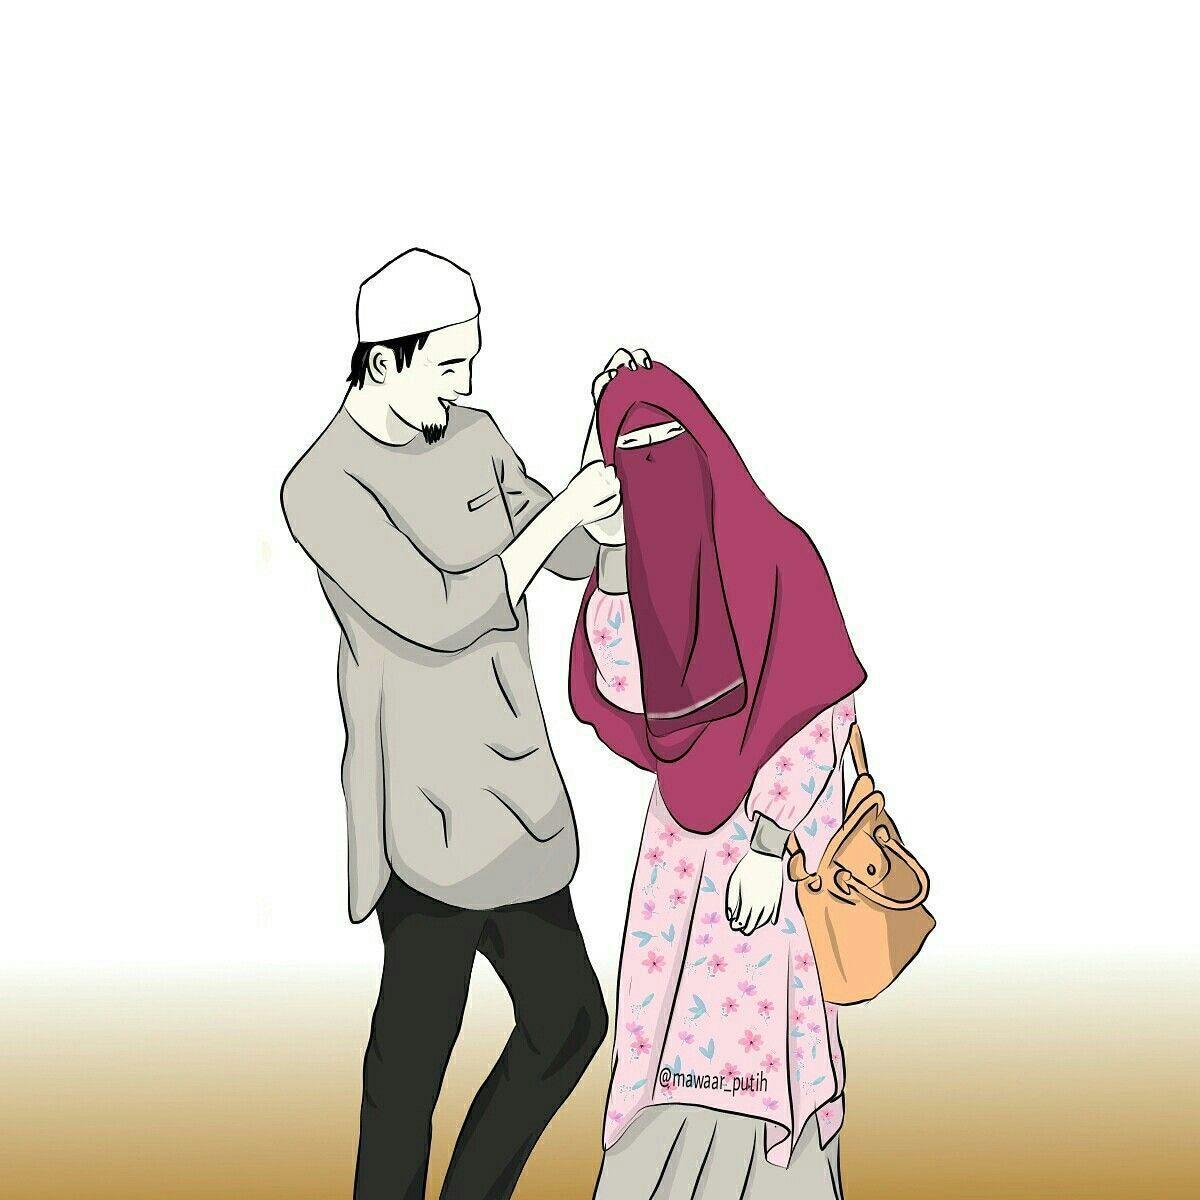 Muslim Couple Cartoon Wallpapers Top Free Muslim Couple Cartoon Backgrounds Wallpaperaccess